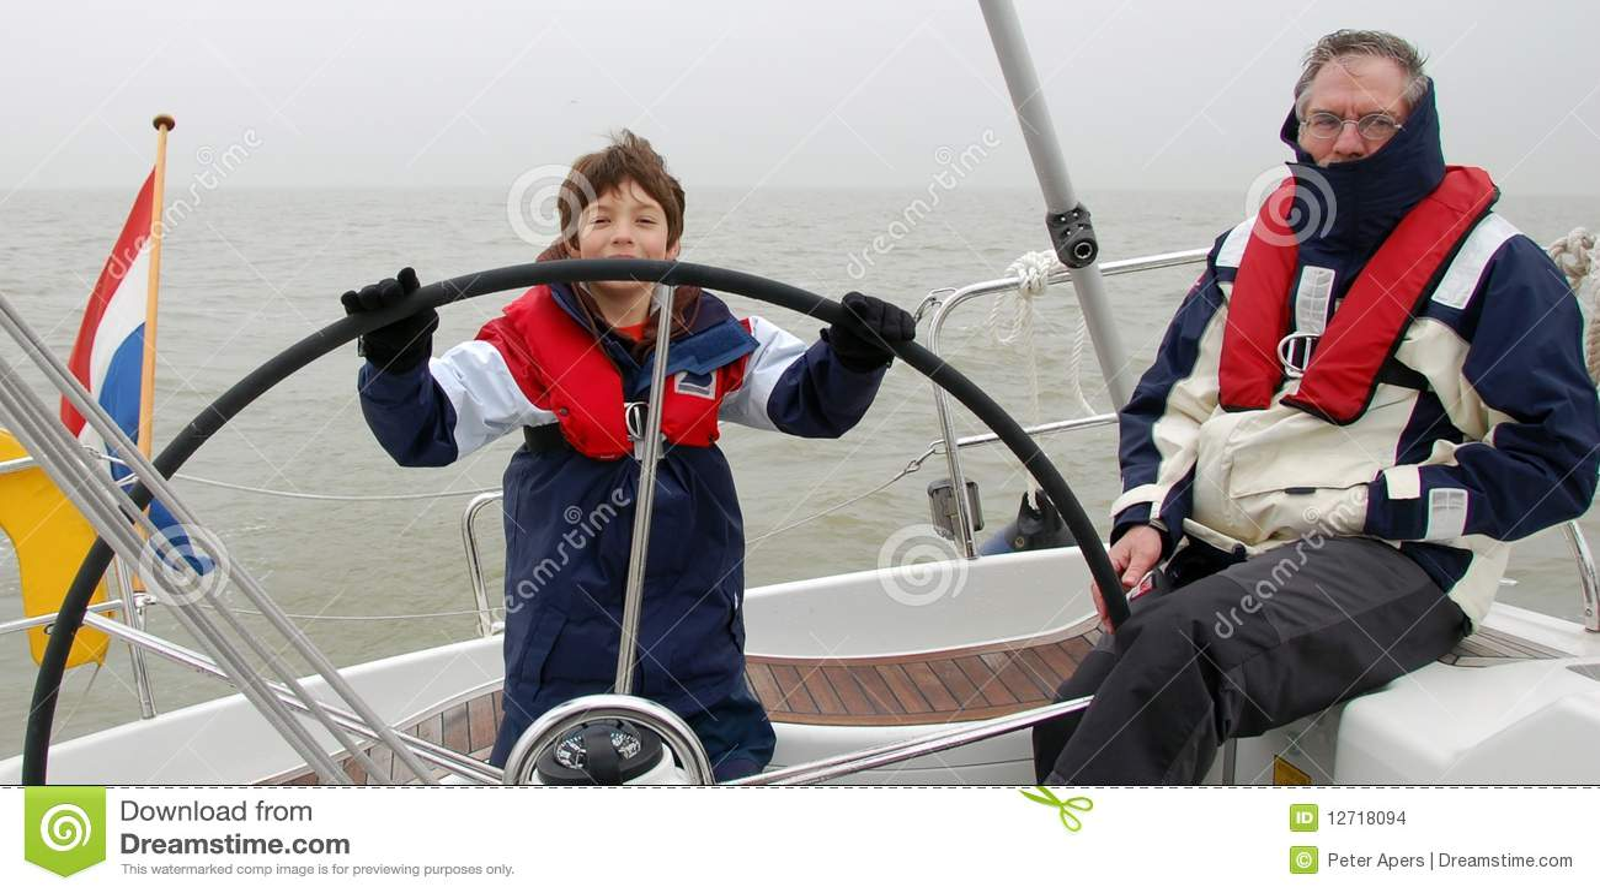 Generations of sailors